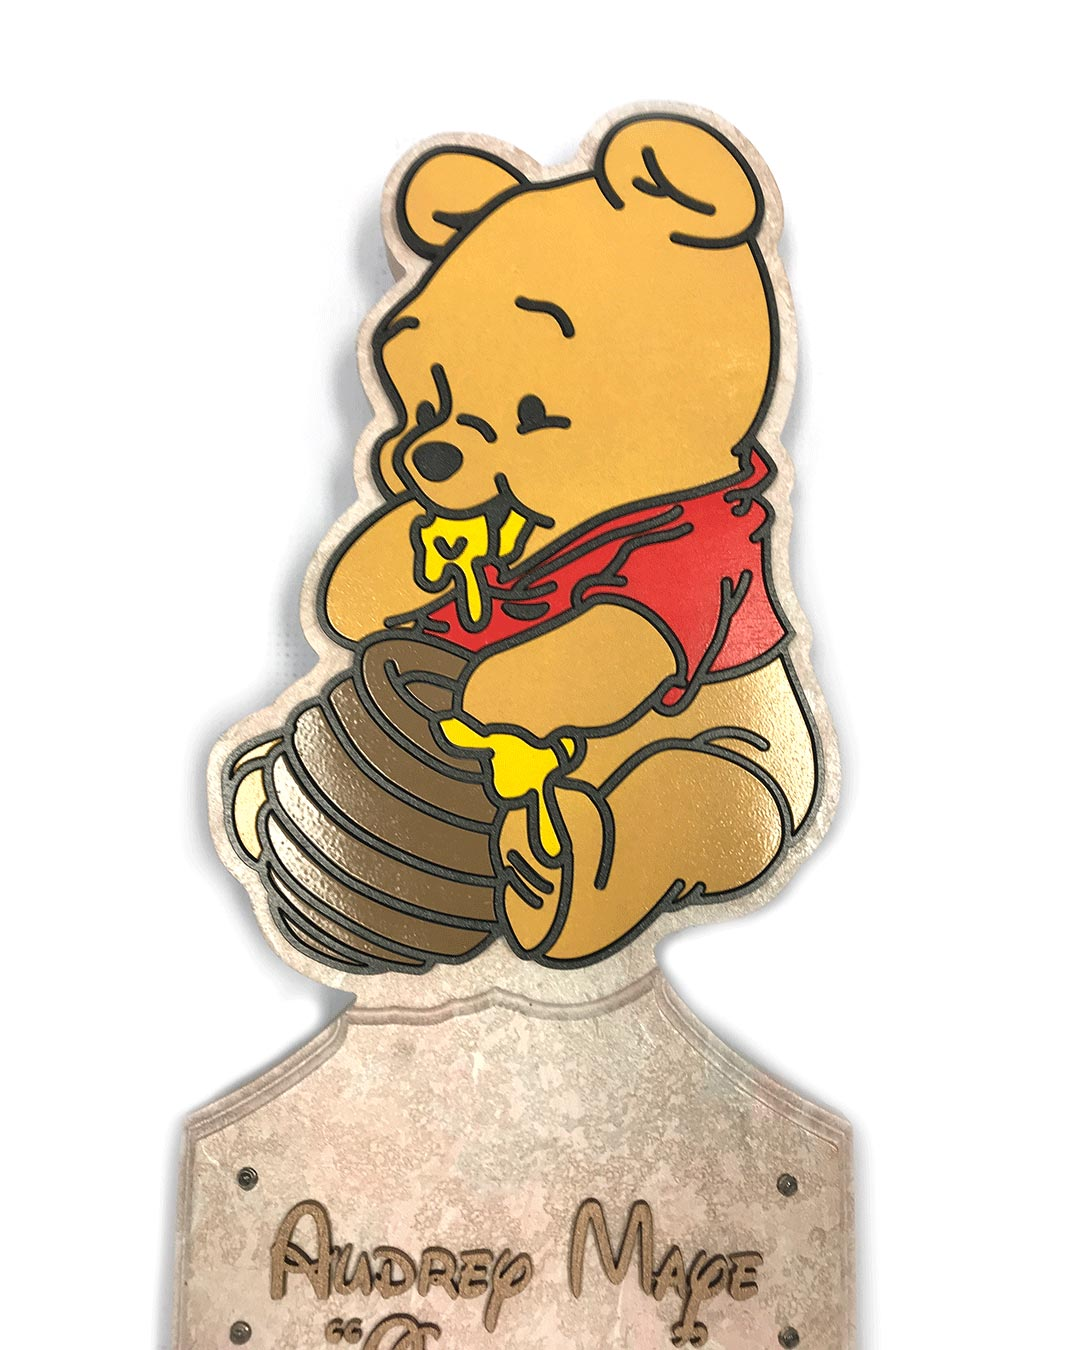 pooh bear character handle